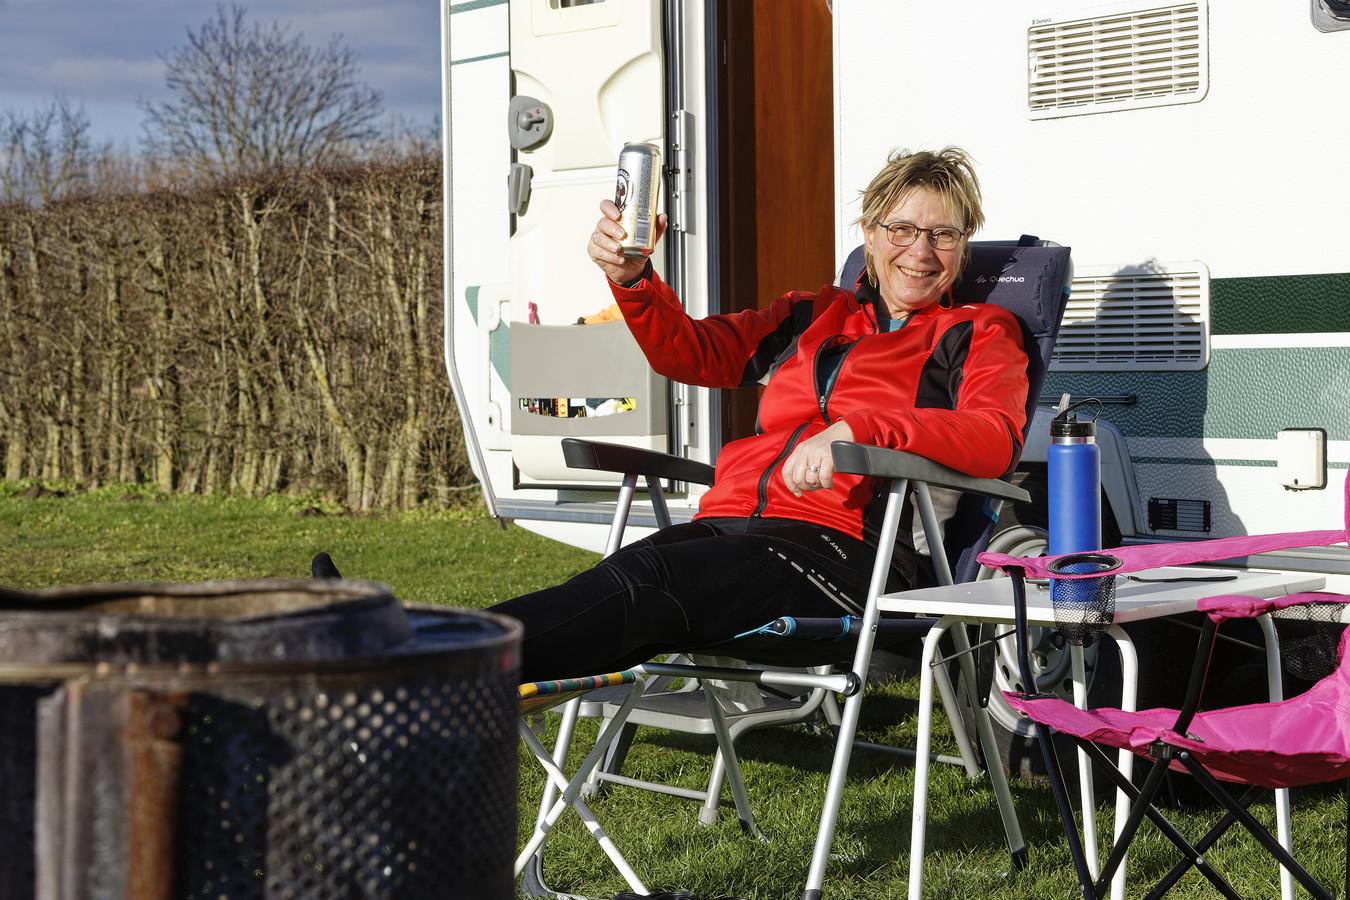 skonste plekske camping schijndel gast dorine louwers